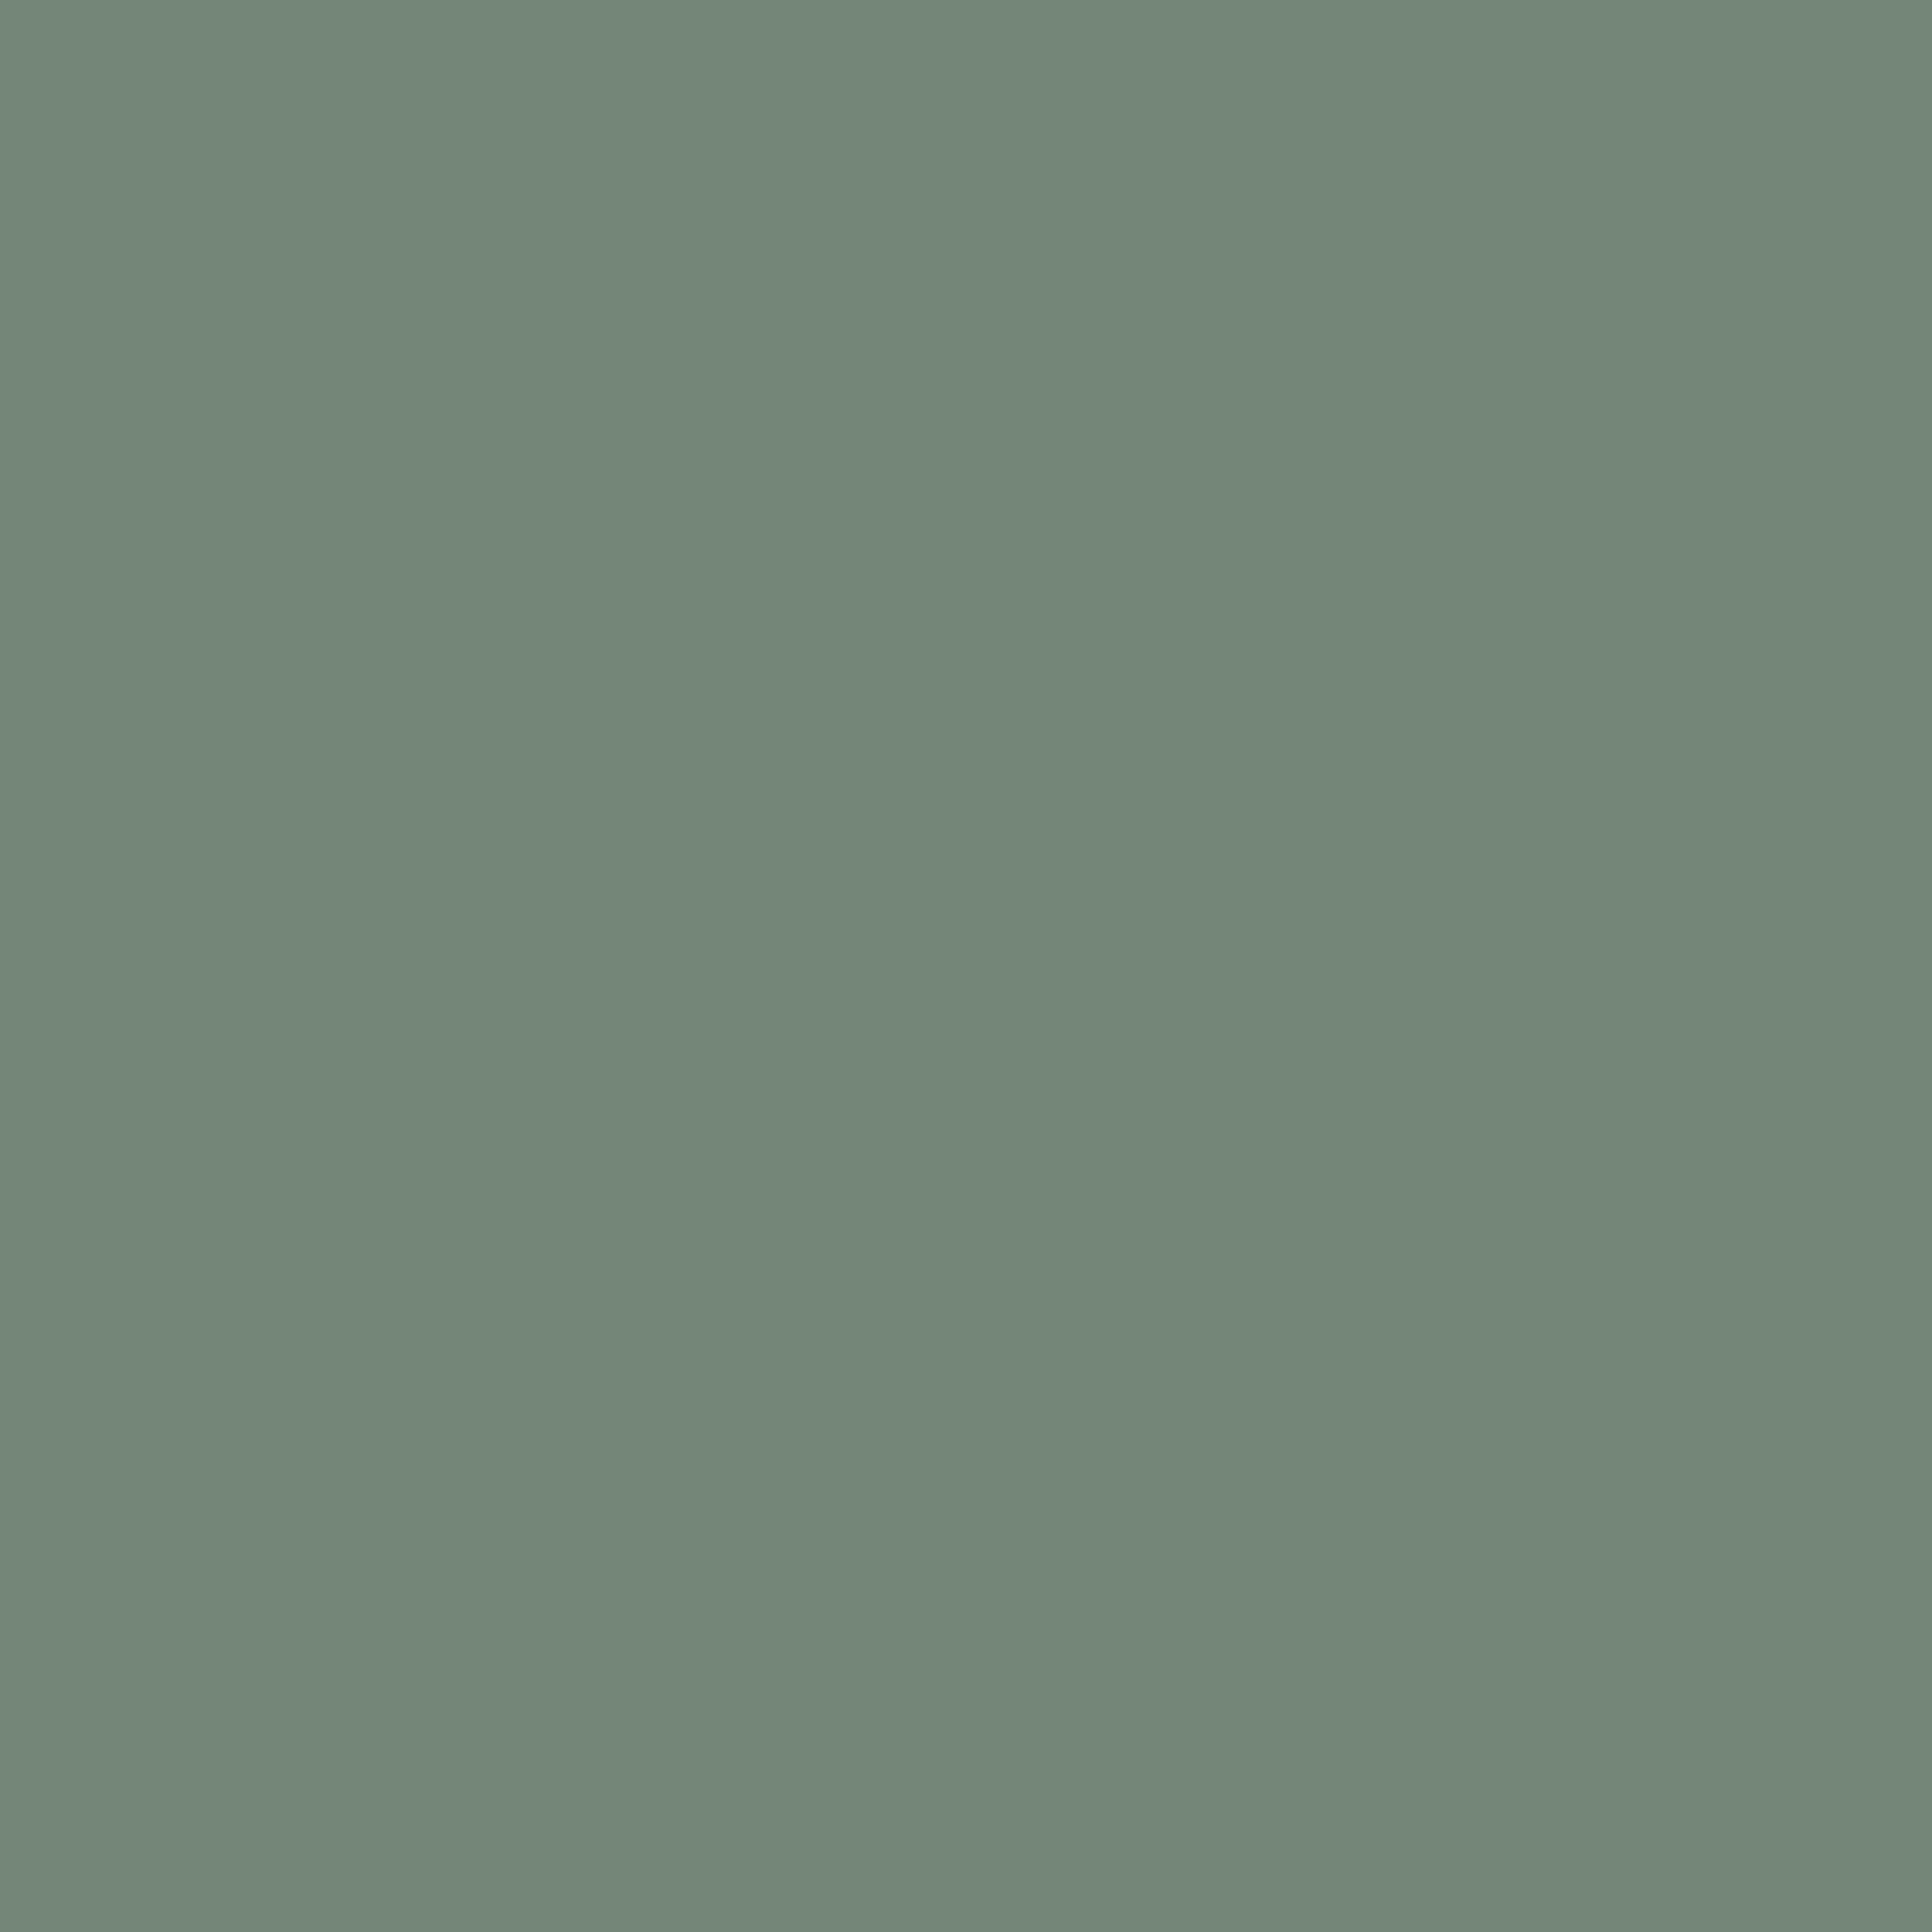 2732x2732 Xanadu Solid Color Background